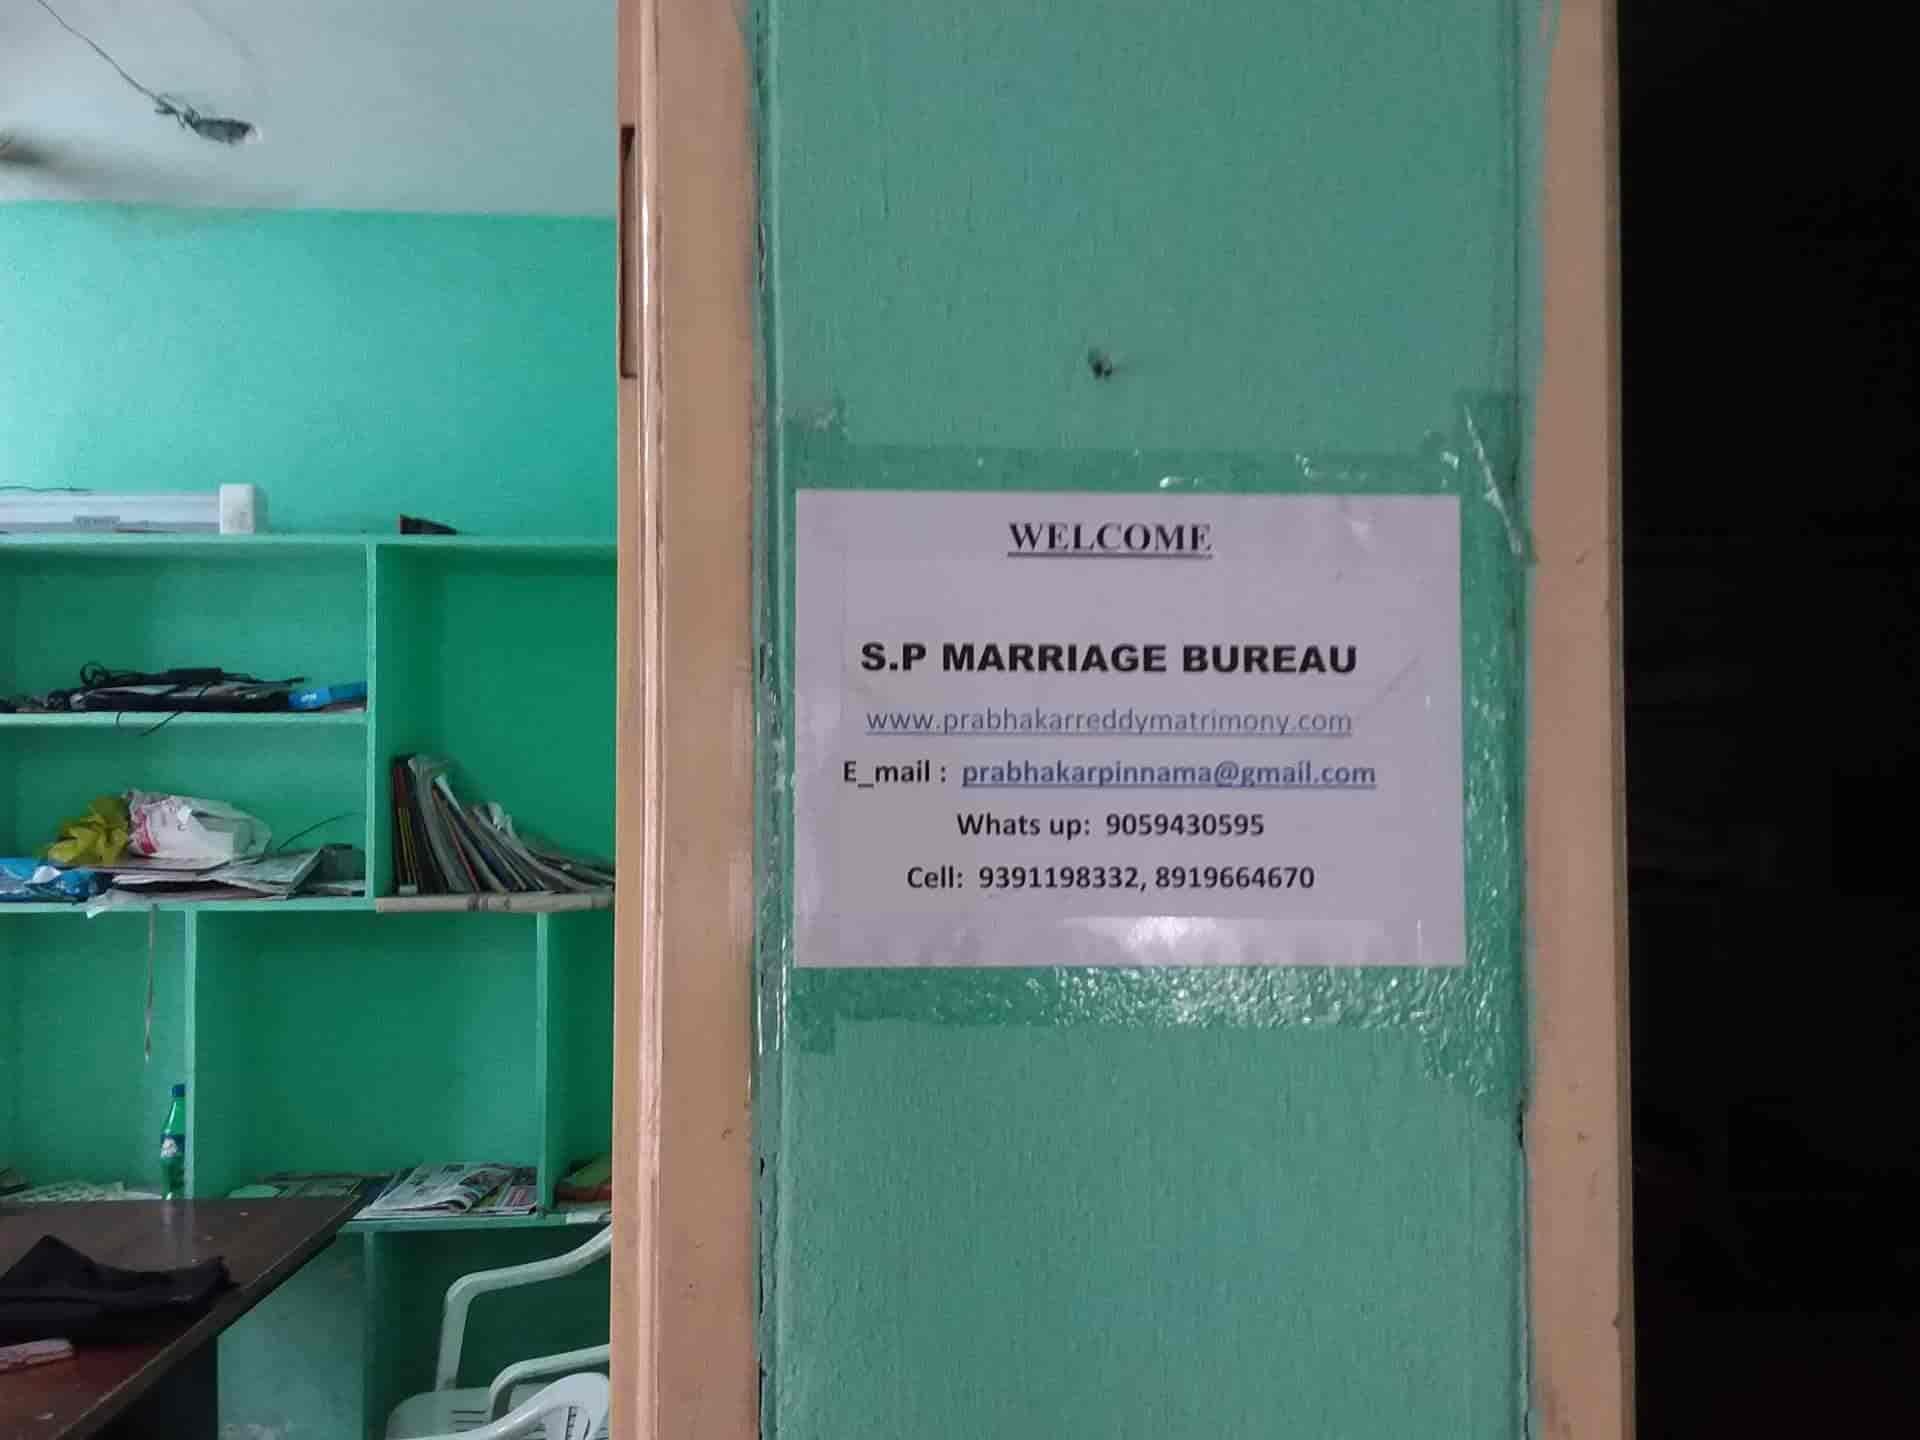 P  Prabhakar Reddy Matrimonial, L B Nagar - Matrimonial Bureaus in